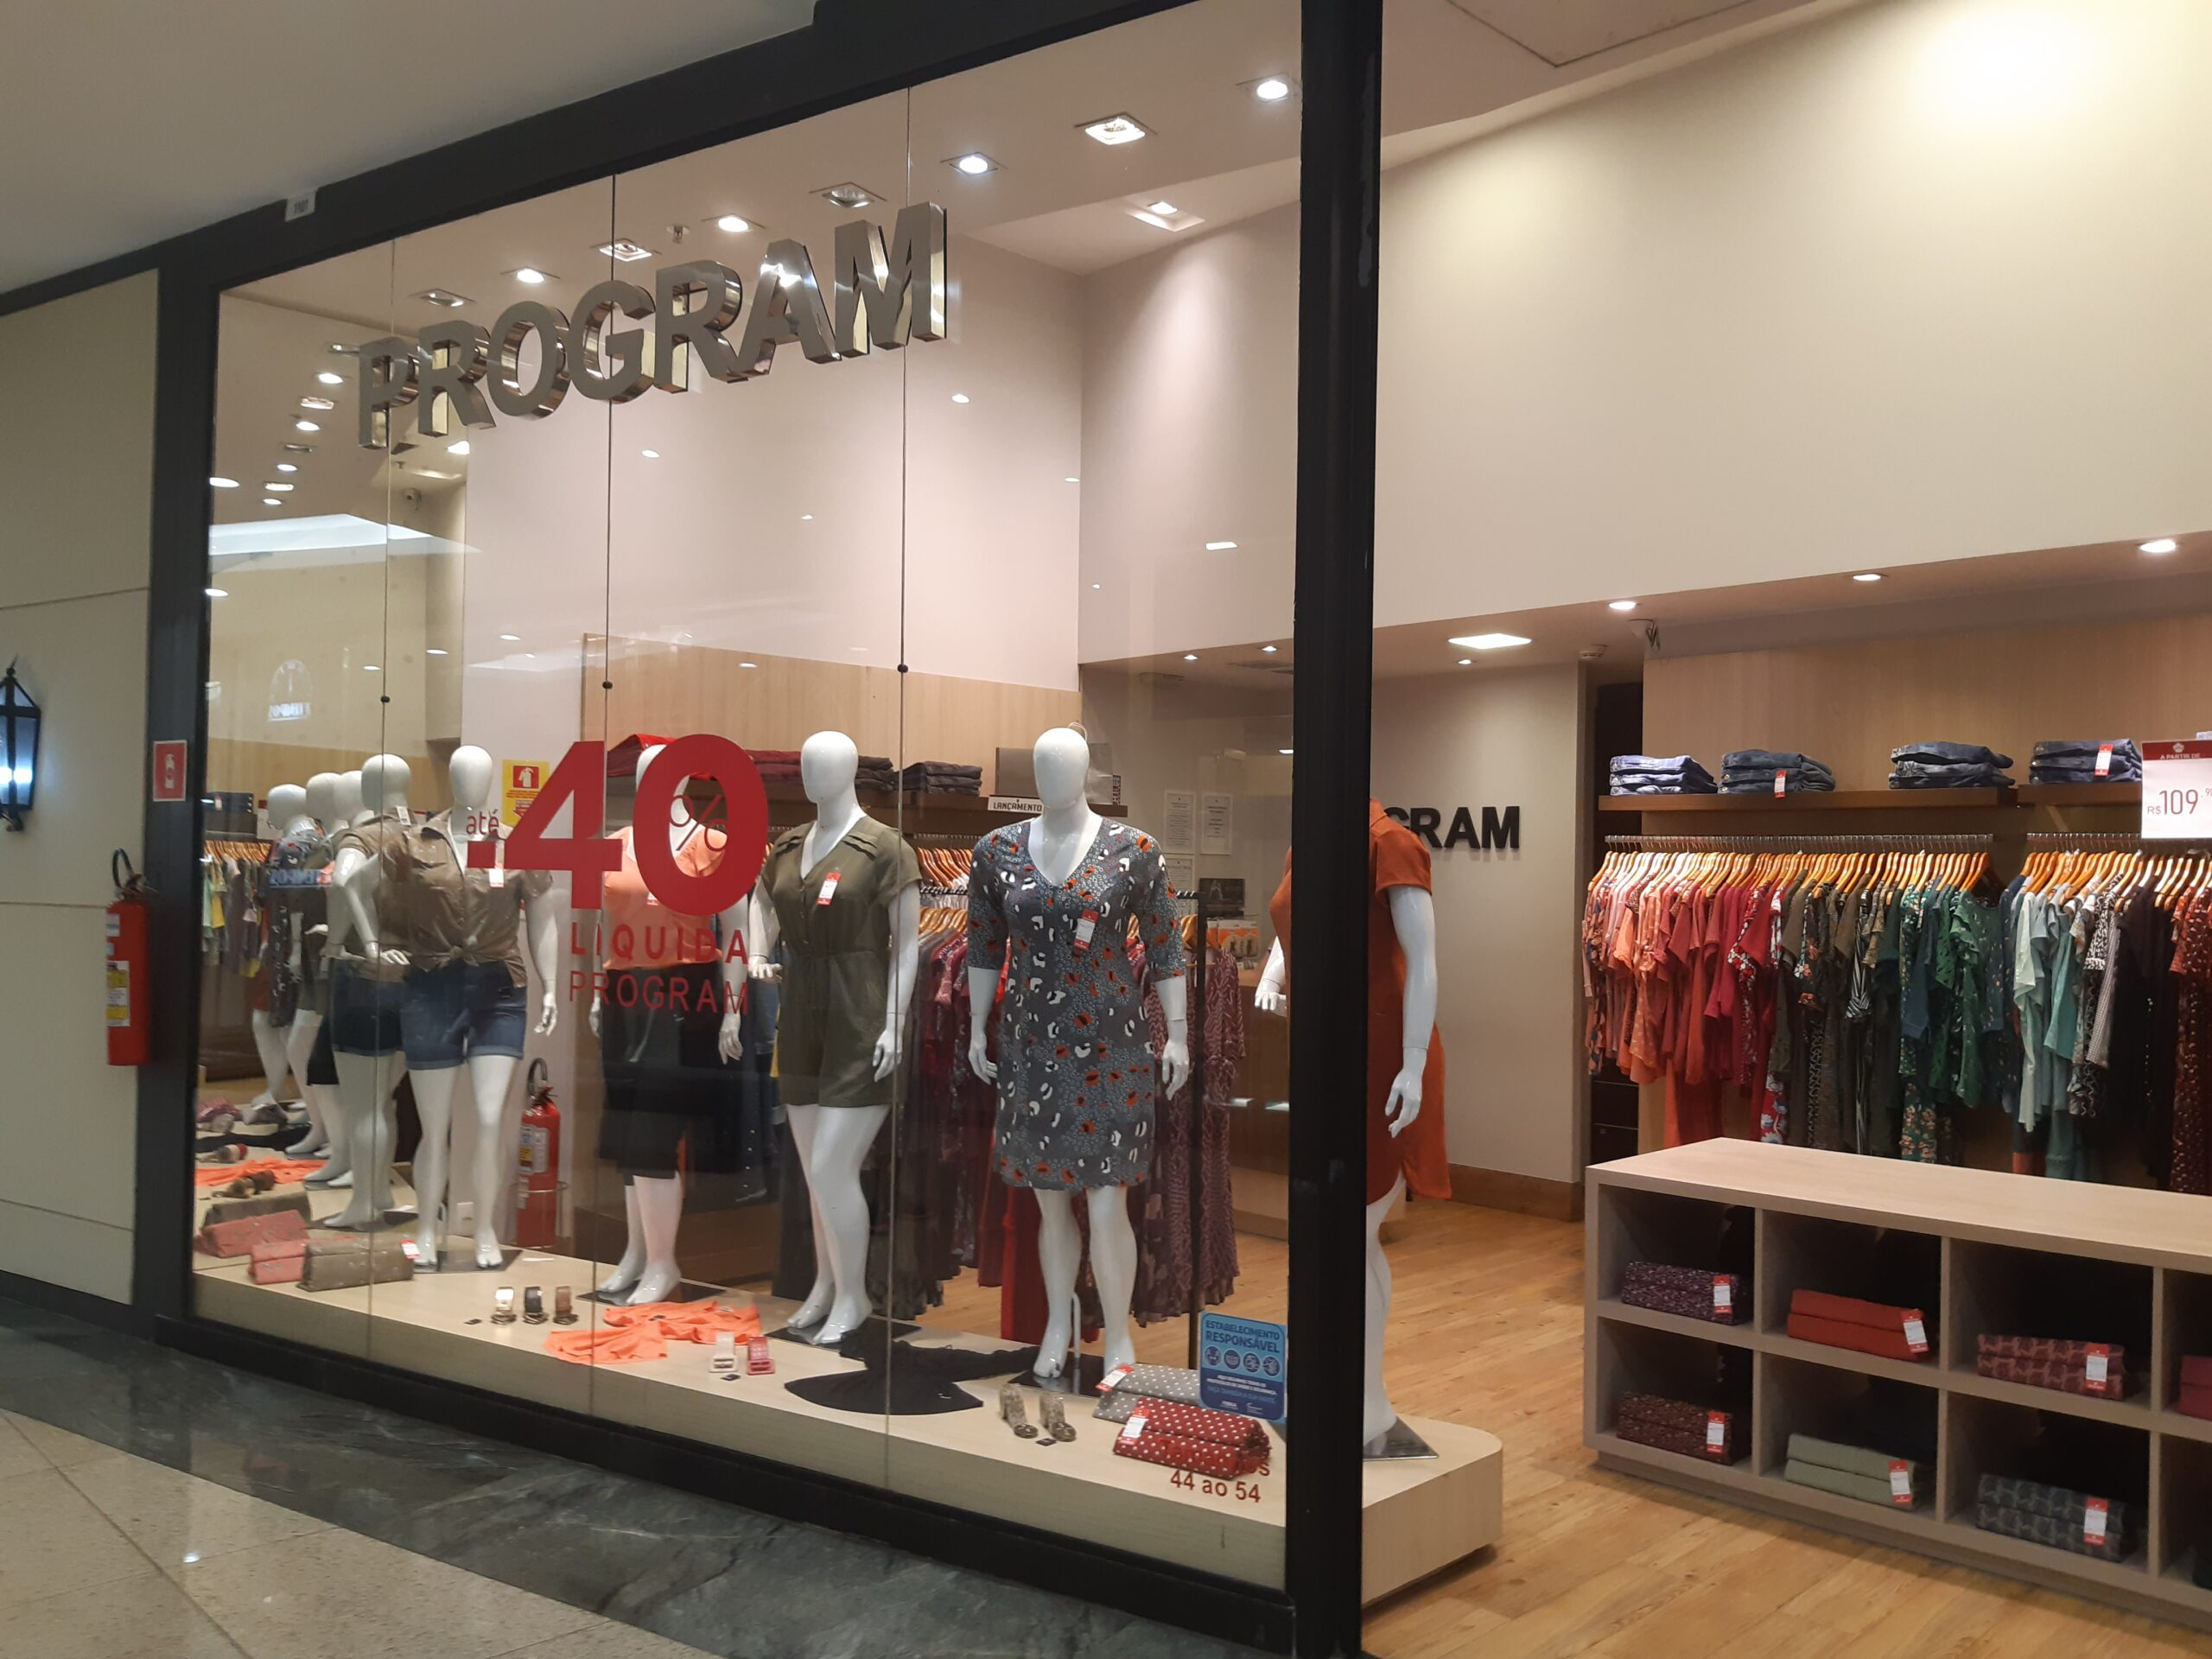 Program Taguatinga Shopping, Comércio Brasilia